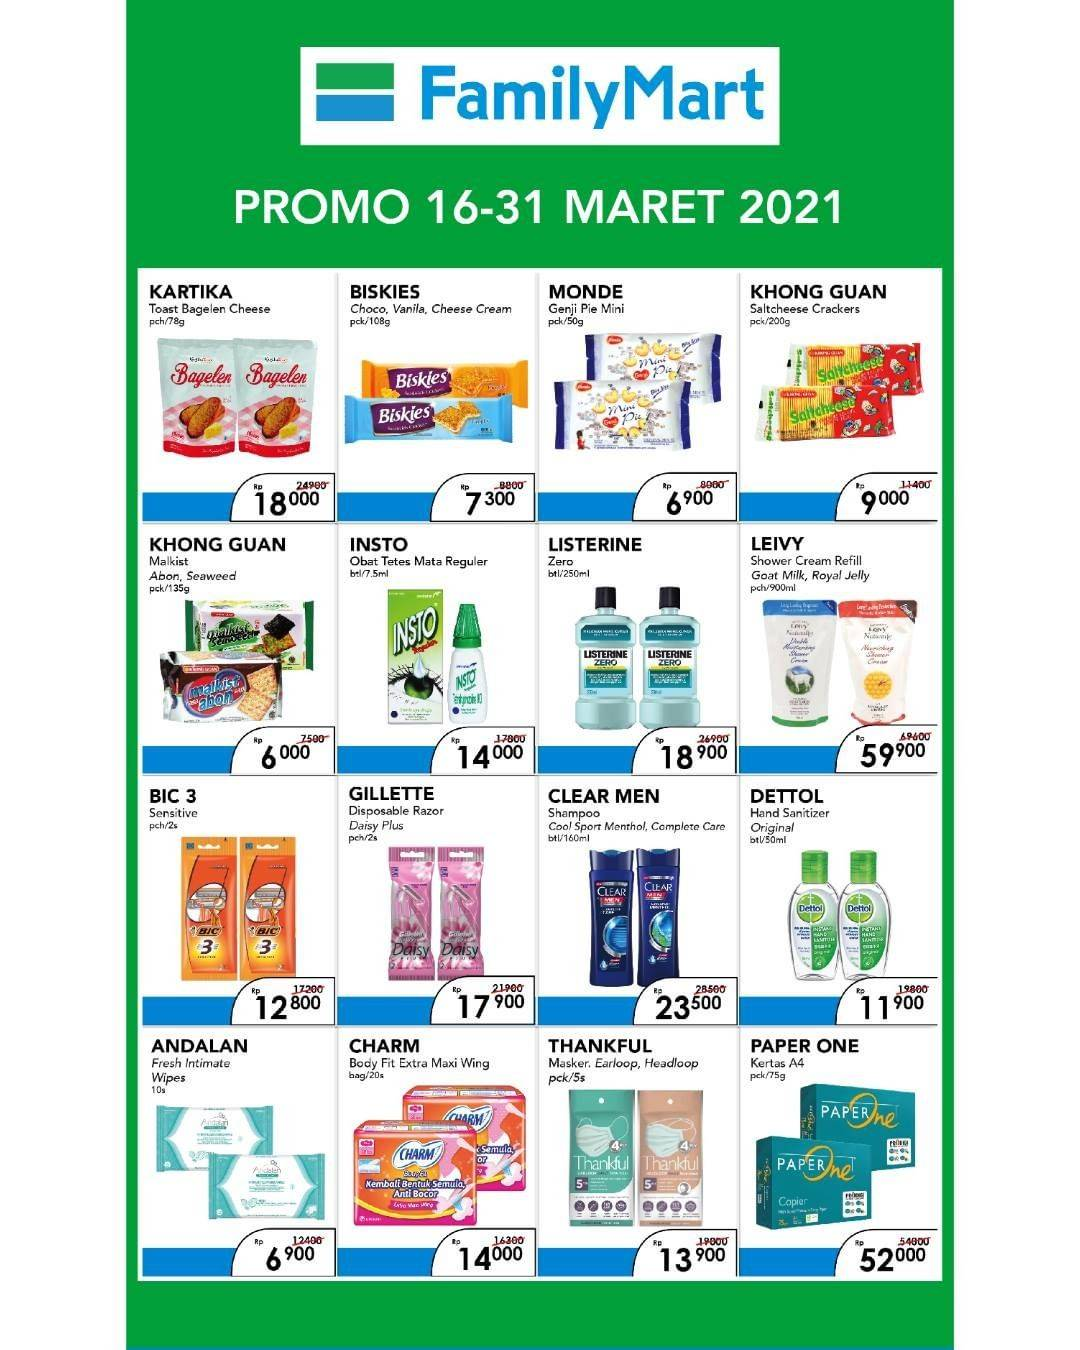 Promo diskon Katalog Promo Familymart Home Care Fair Periode 16 - 31 Maret 2021